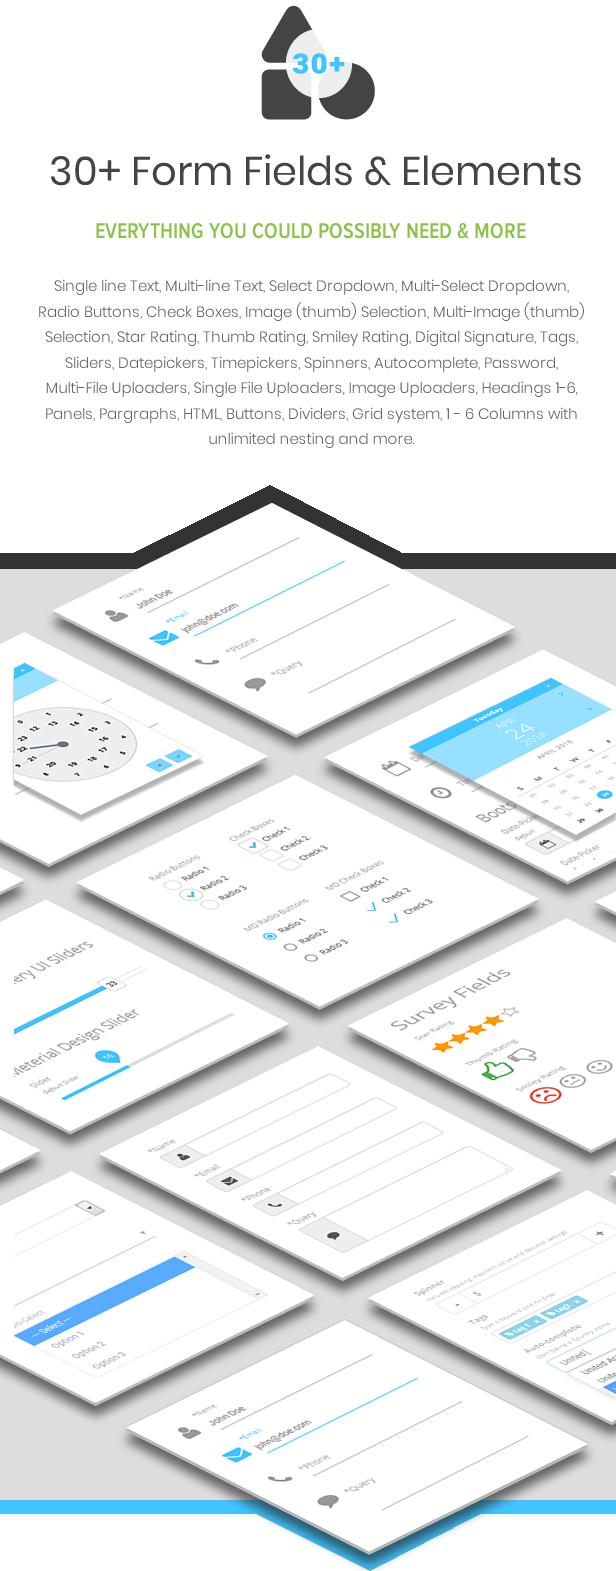 Best WordPress Form Builder Plugin - 30+ Form Fields and Elements